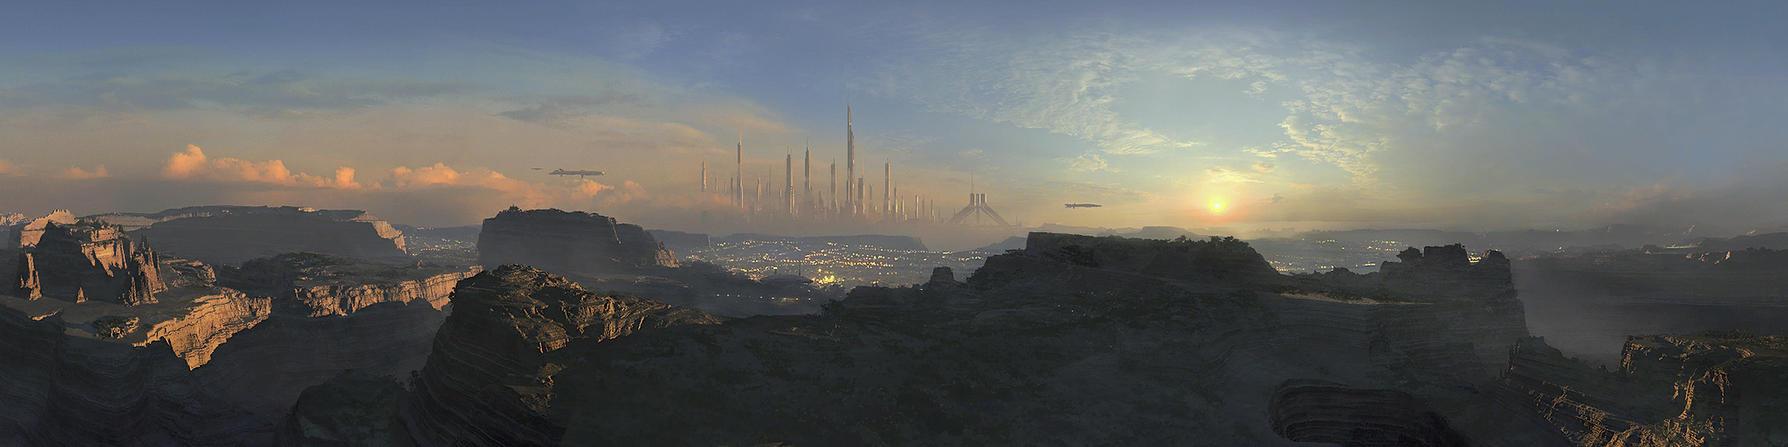 Mass Effect 2 Bekenstein by droot1986